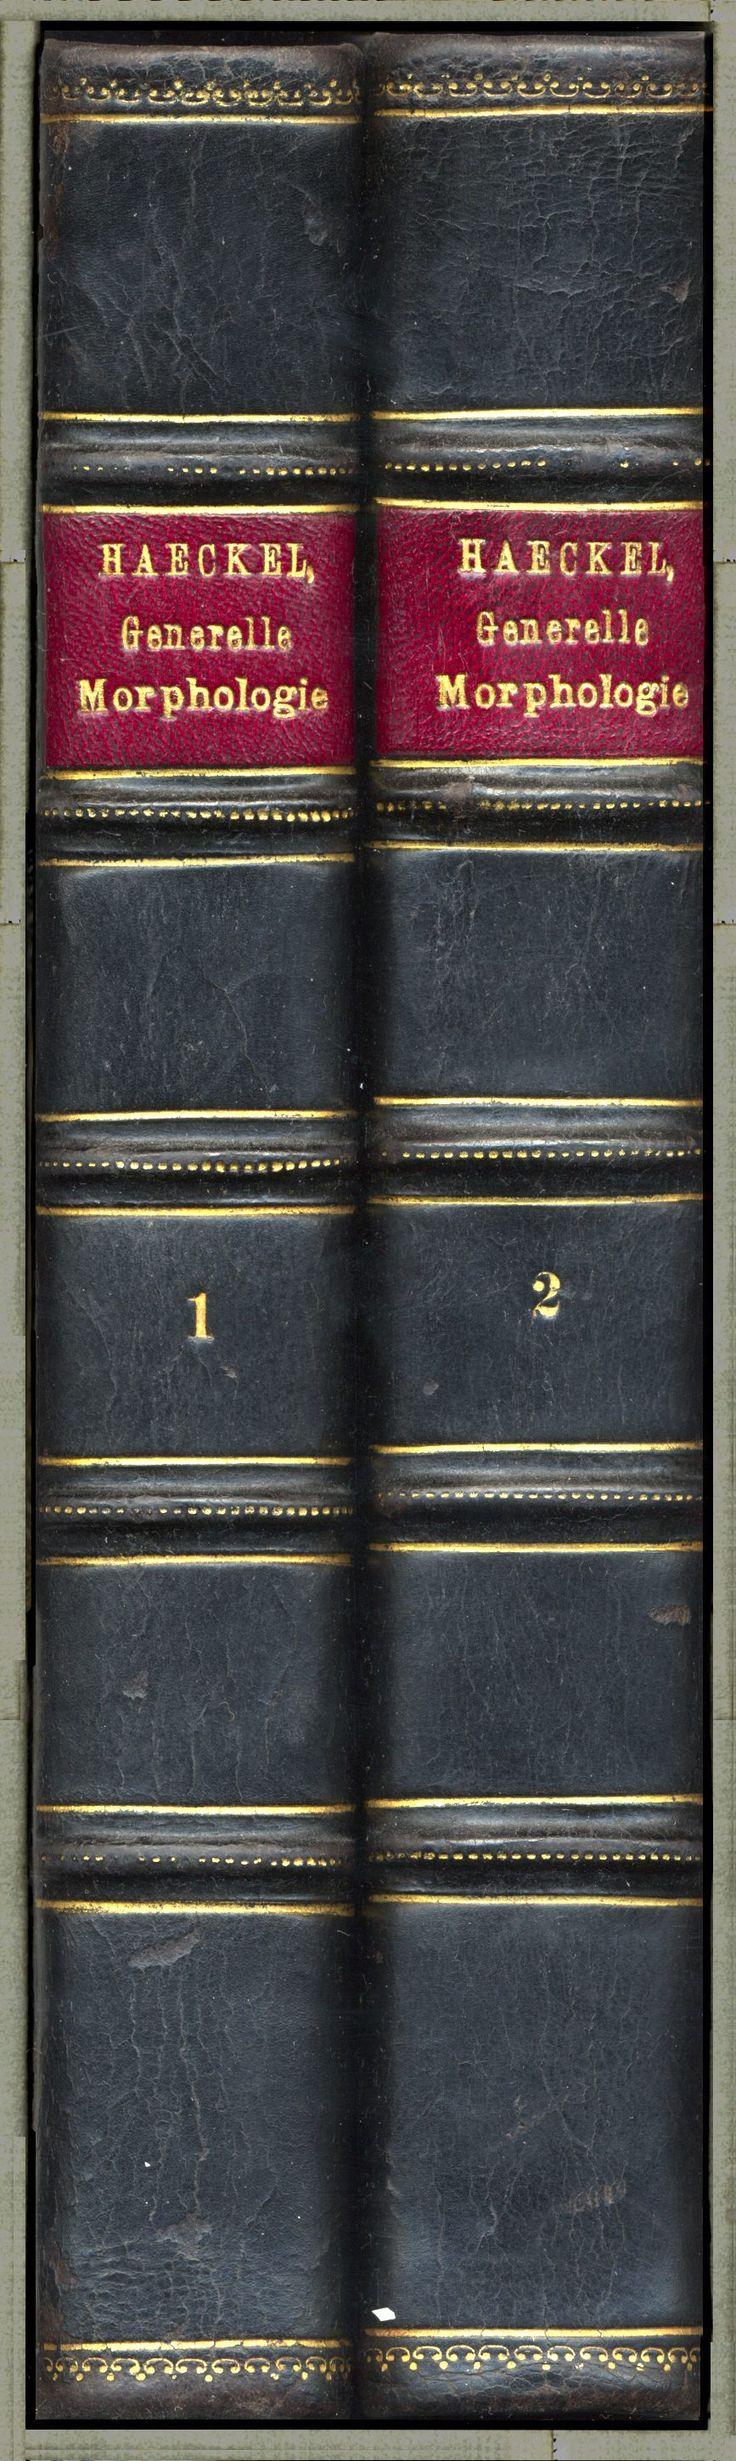 Ernst Haeckel Generelle Morphologie der Organismen 1866